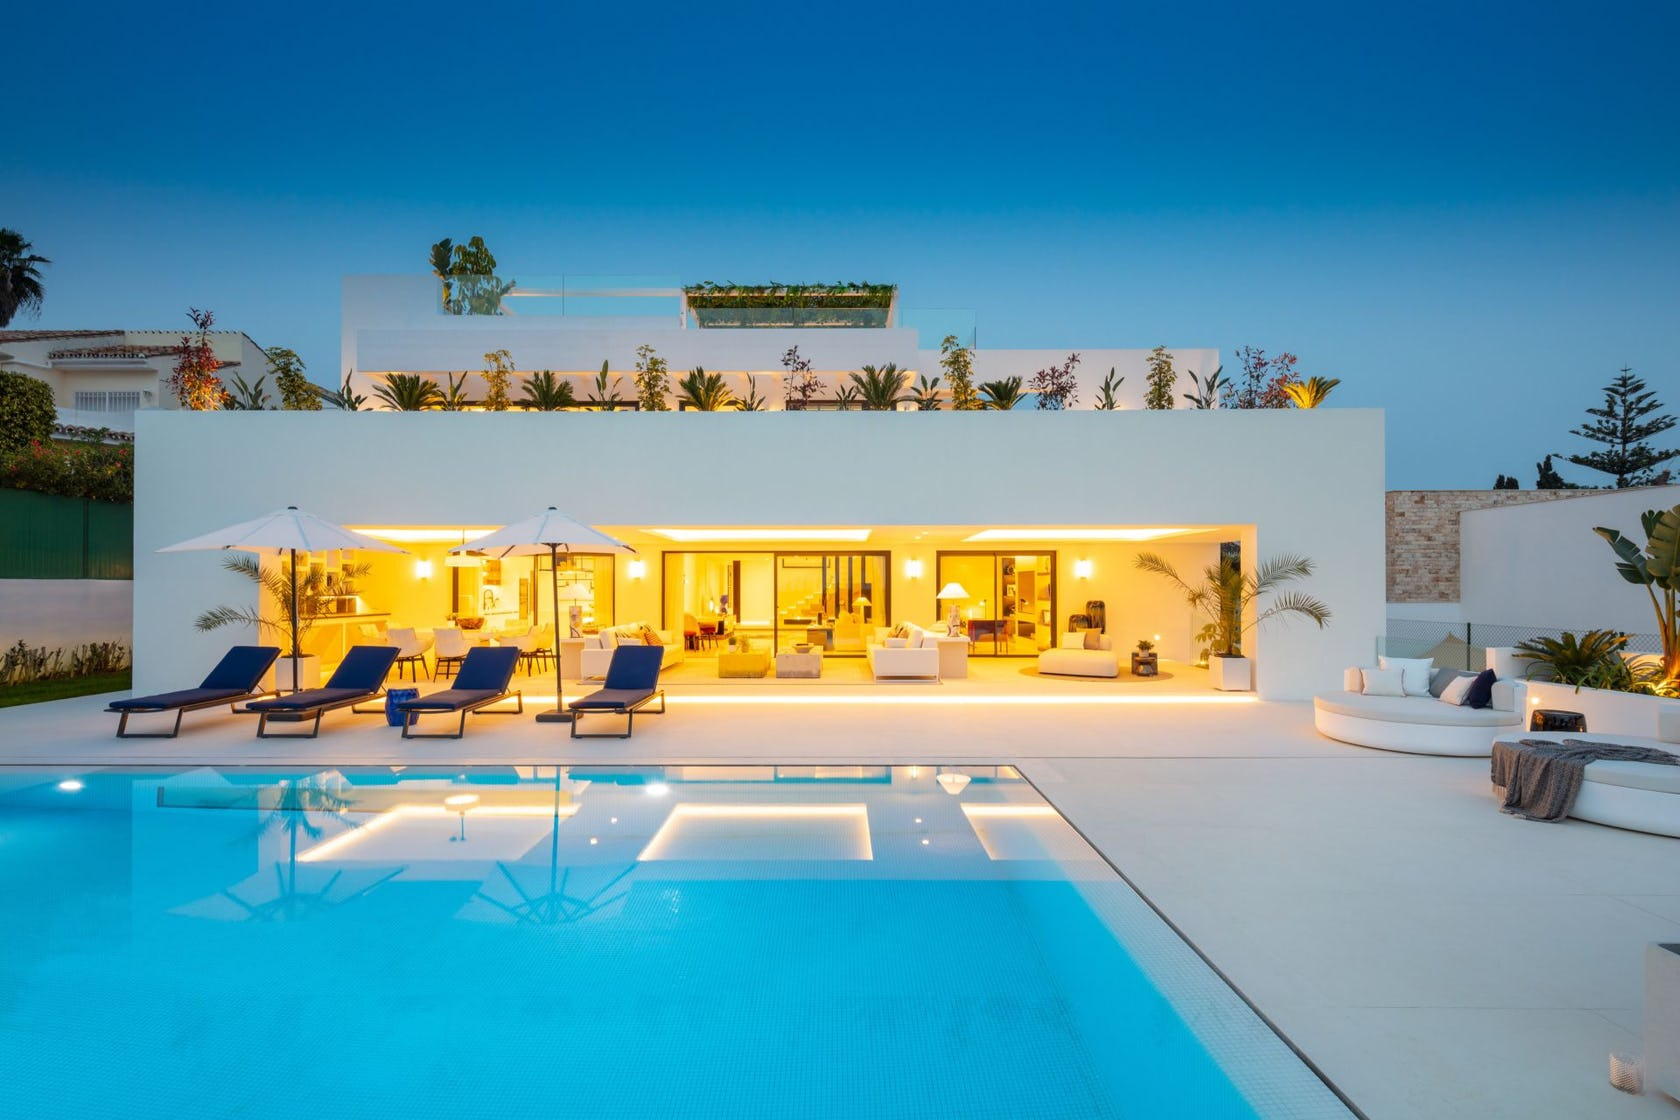 pool water building hotel resort swimming pool